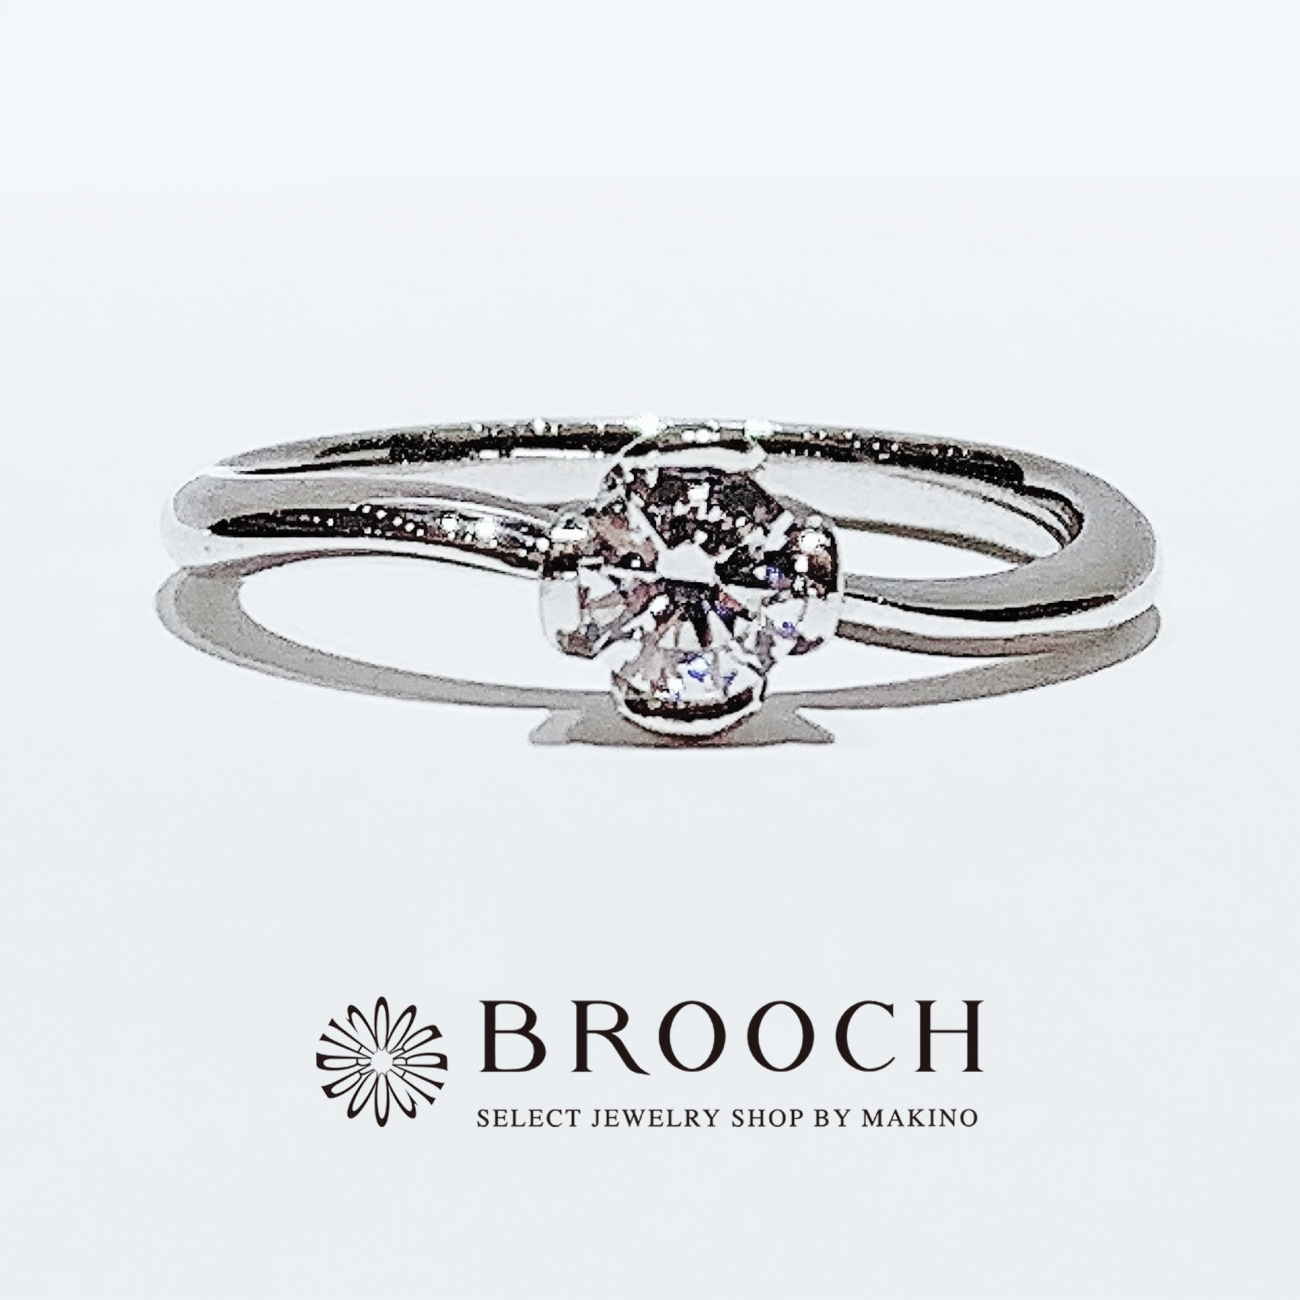 BROOCH 婚約指輪 エンゲージリング 細めウェーブフラワーデザイン